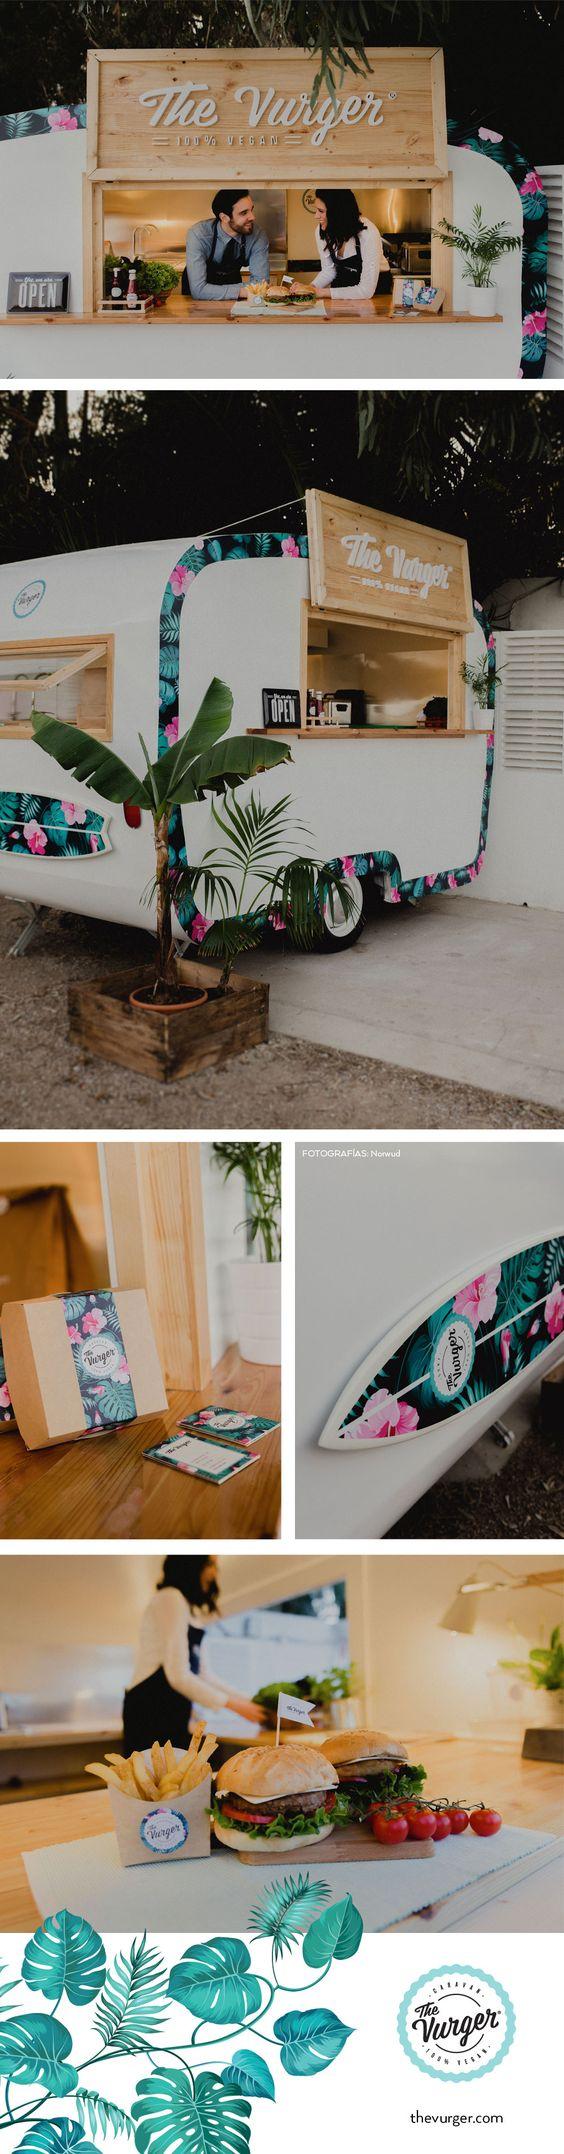 The Vurger Food Truck Caravan · 100% Vegan · Surf style · Tropical ...